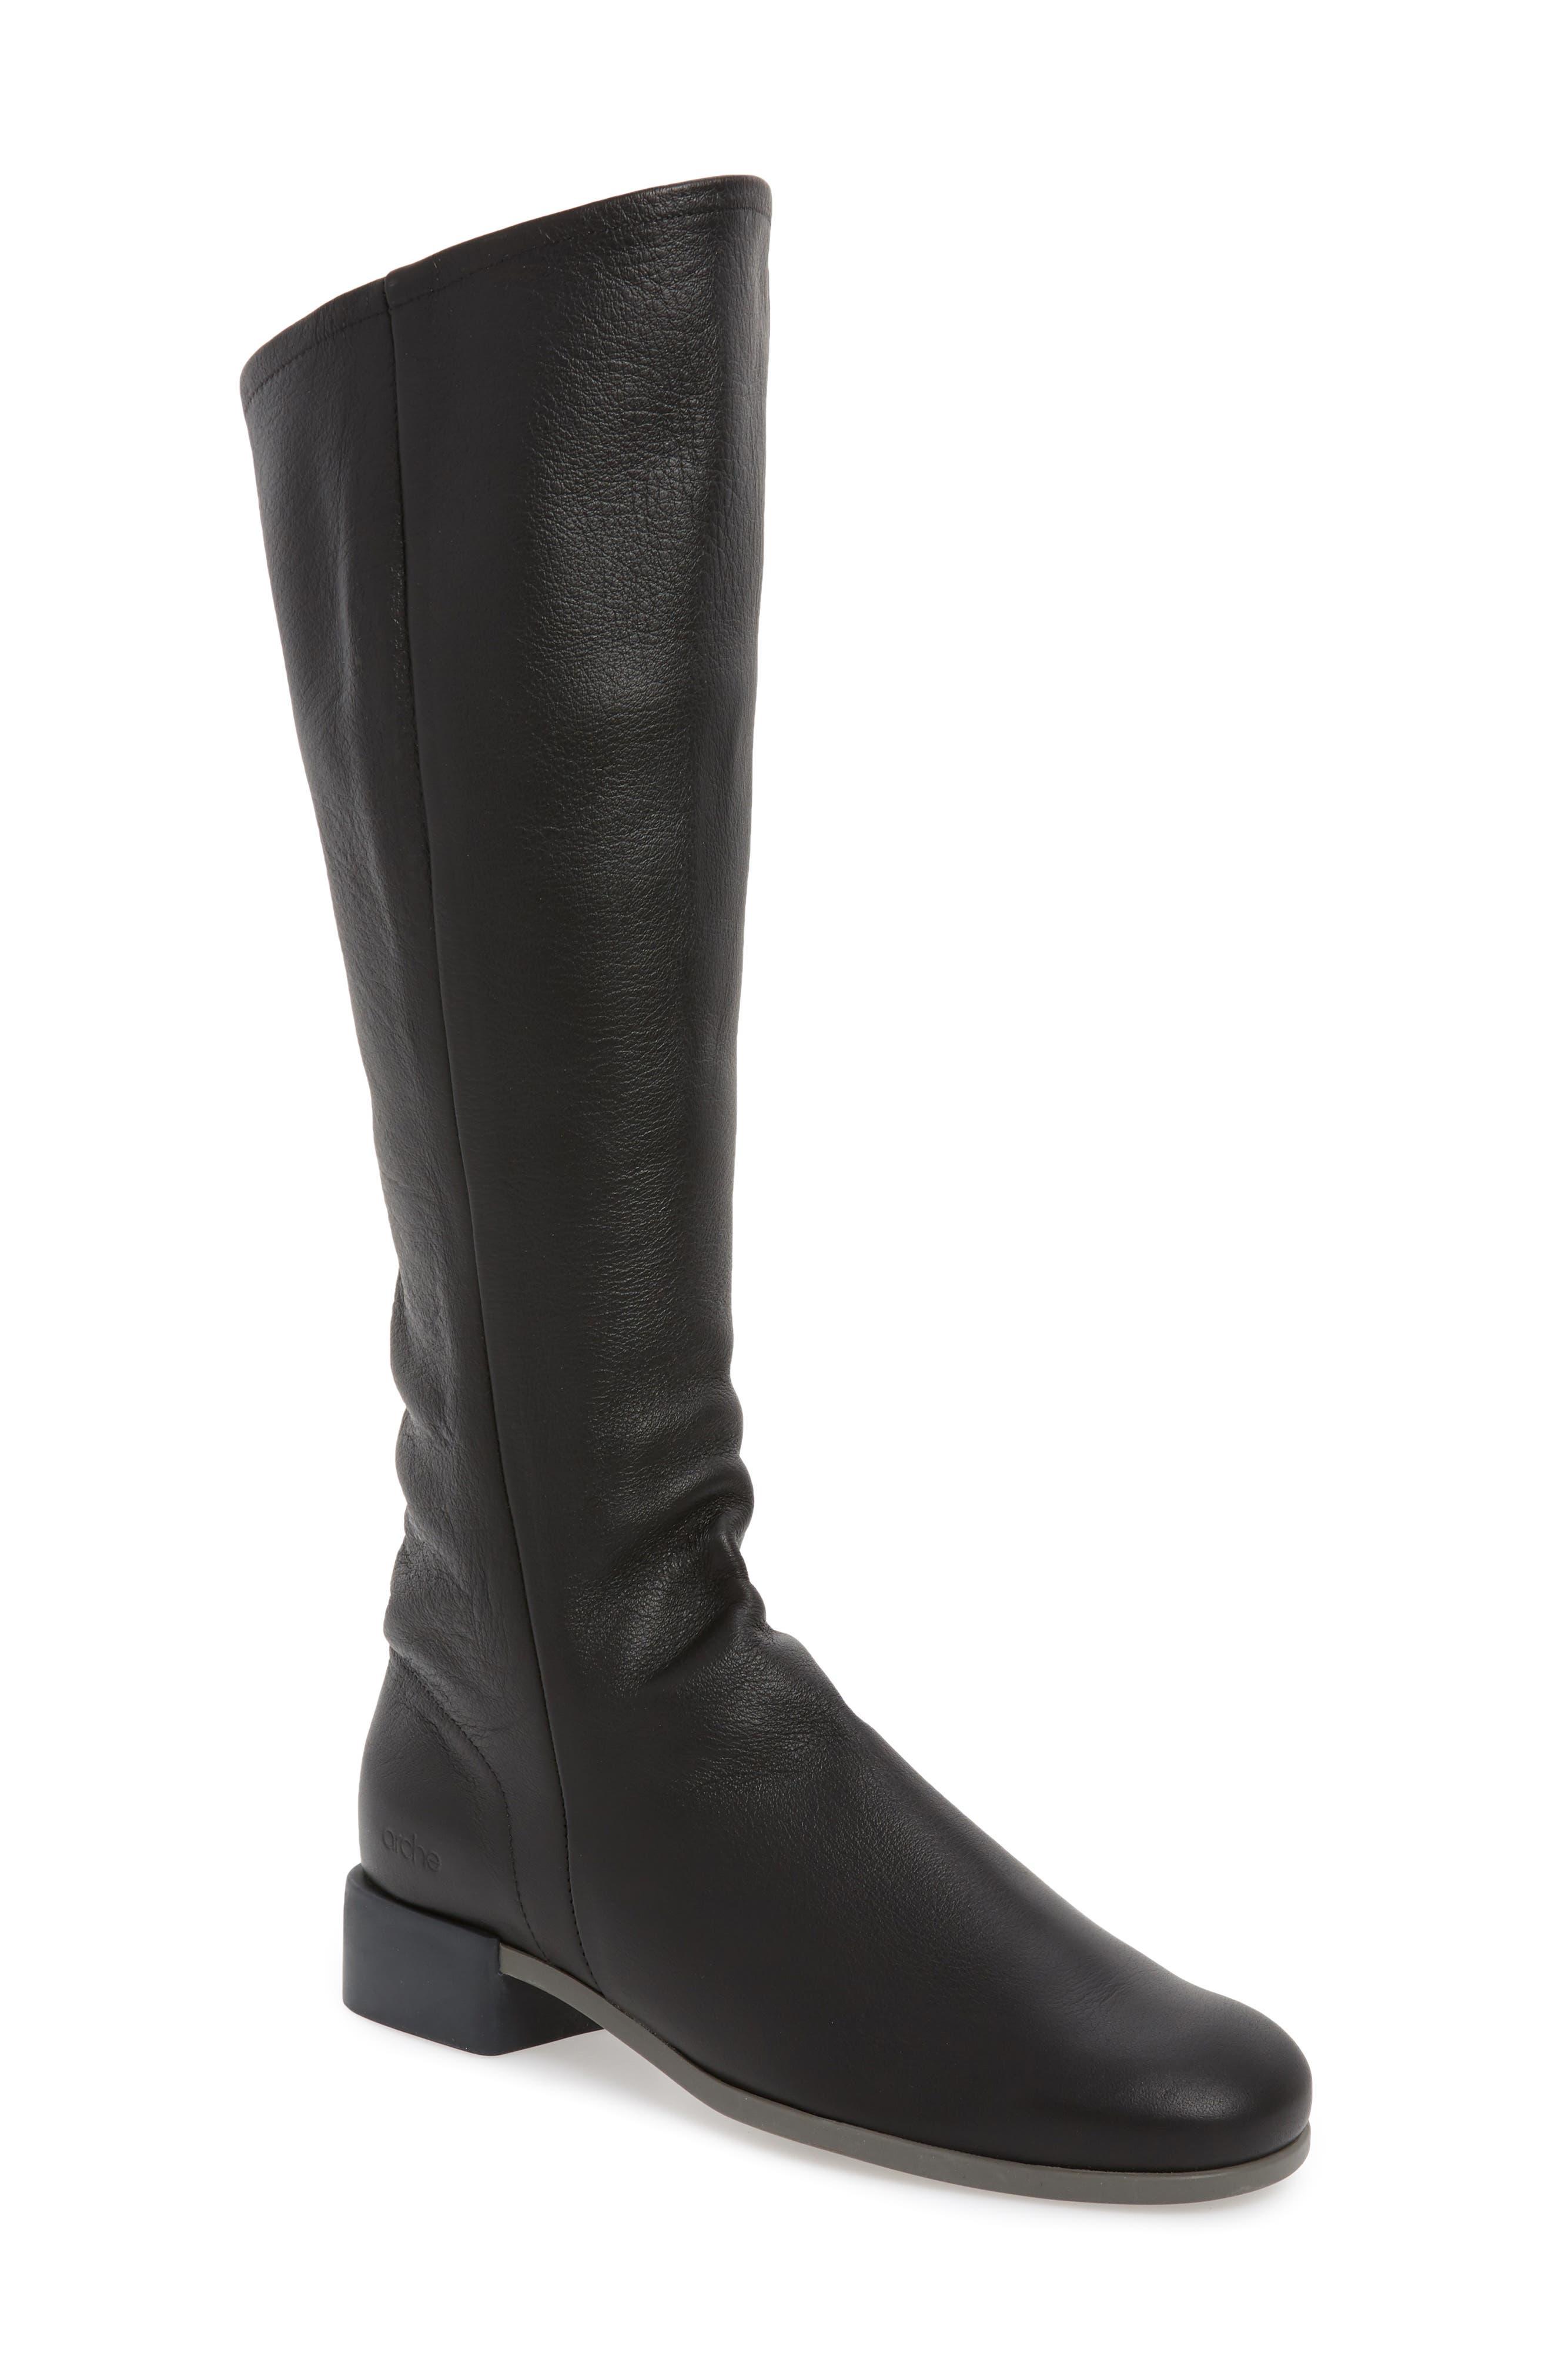 Arche Twigbo Knee High Boot, Black